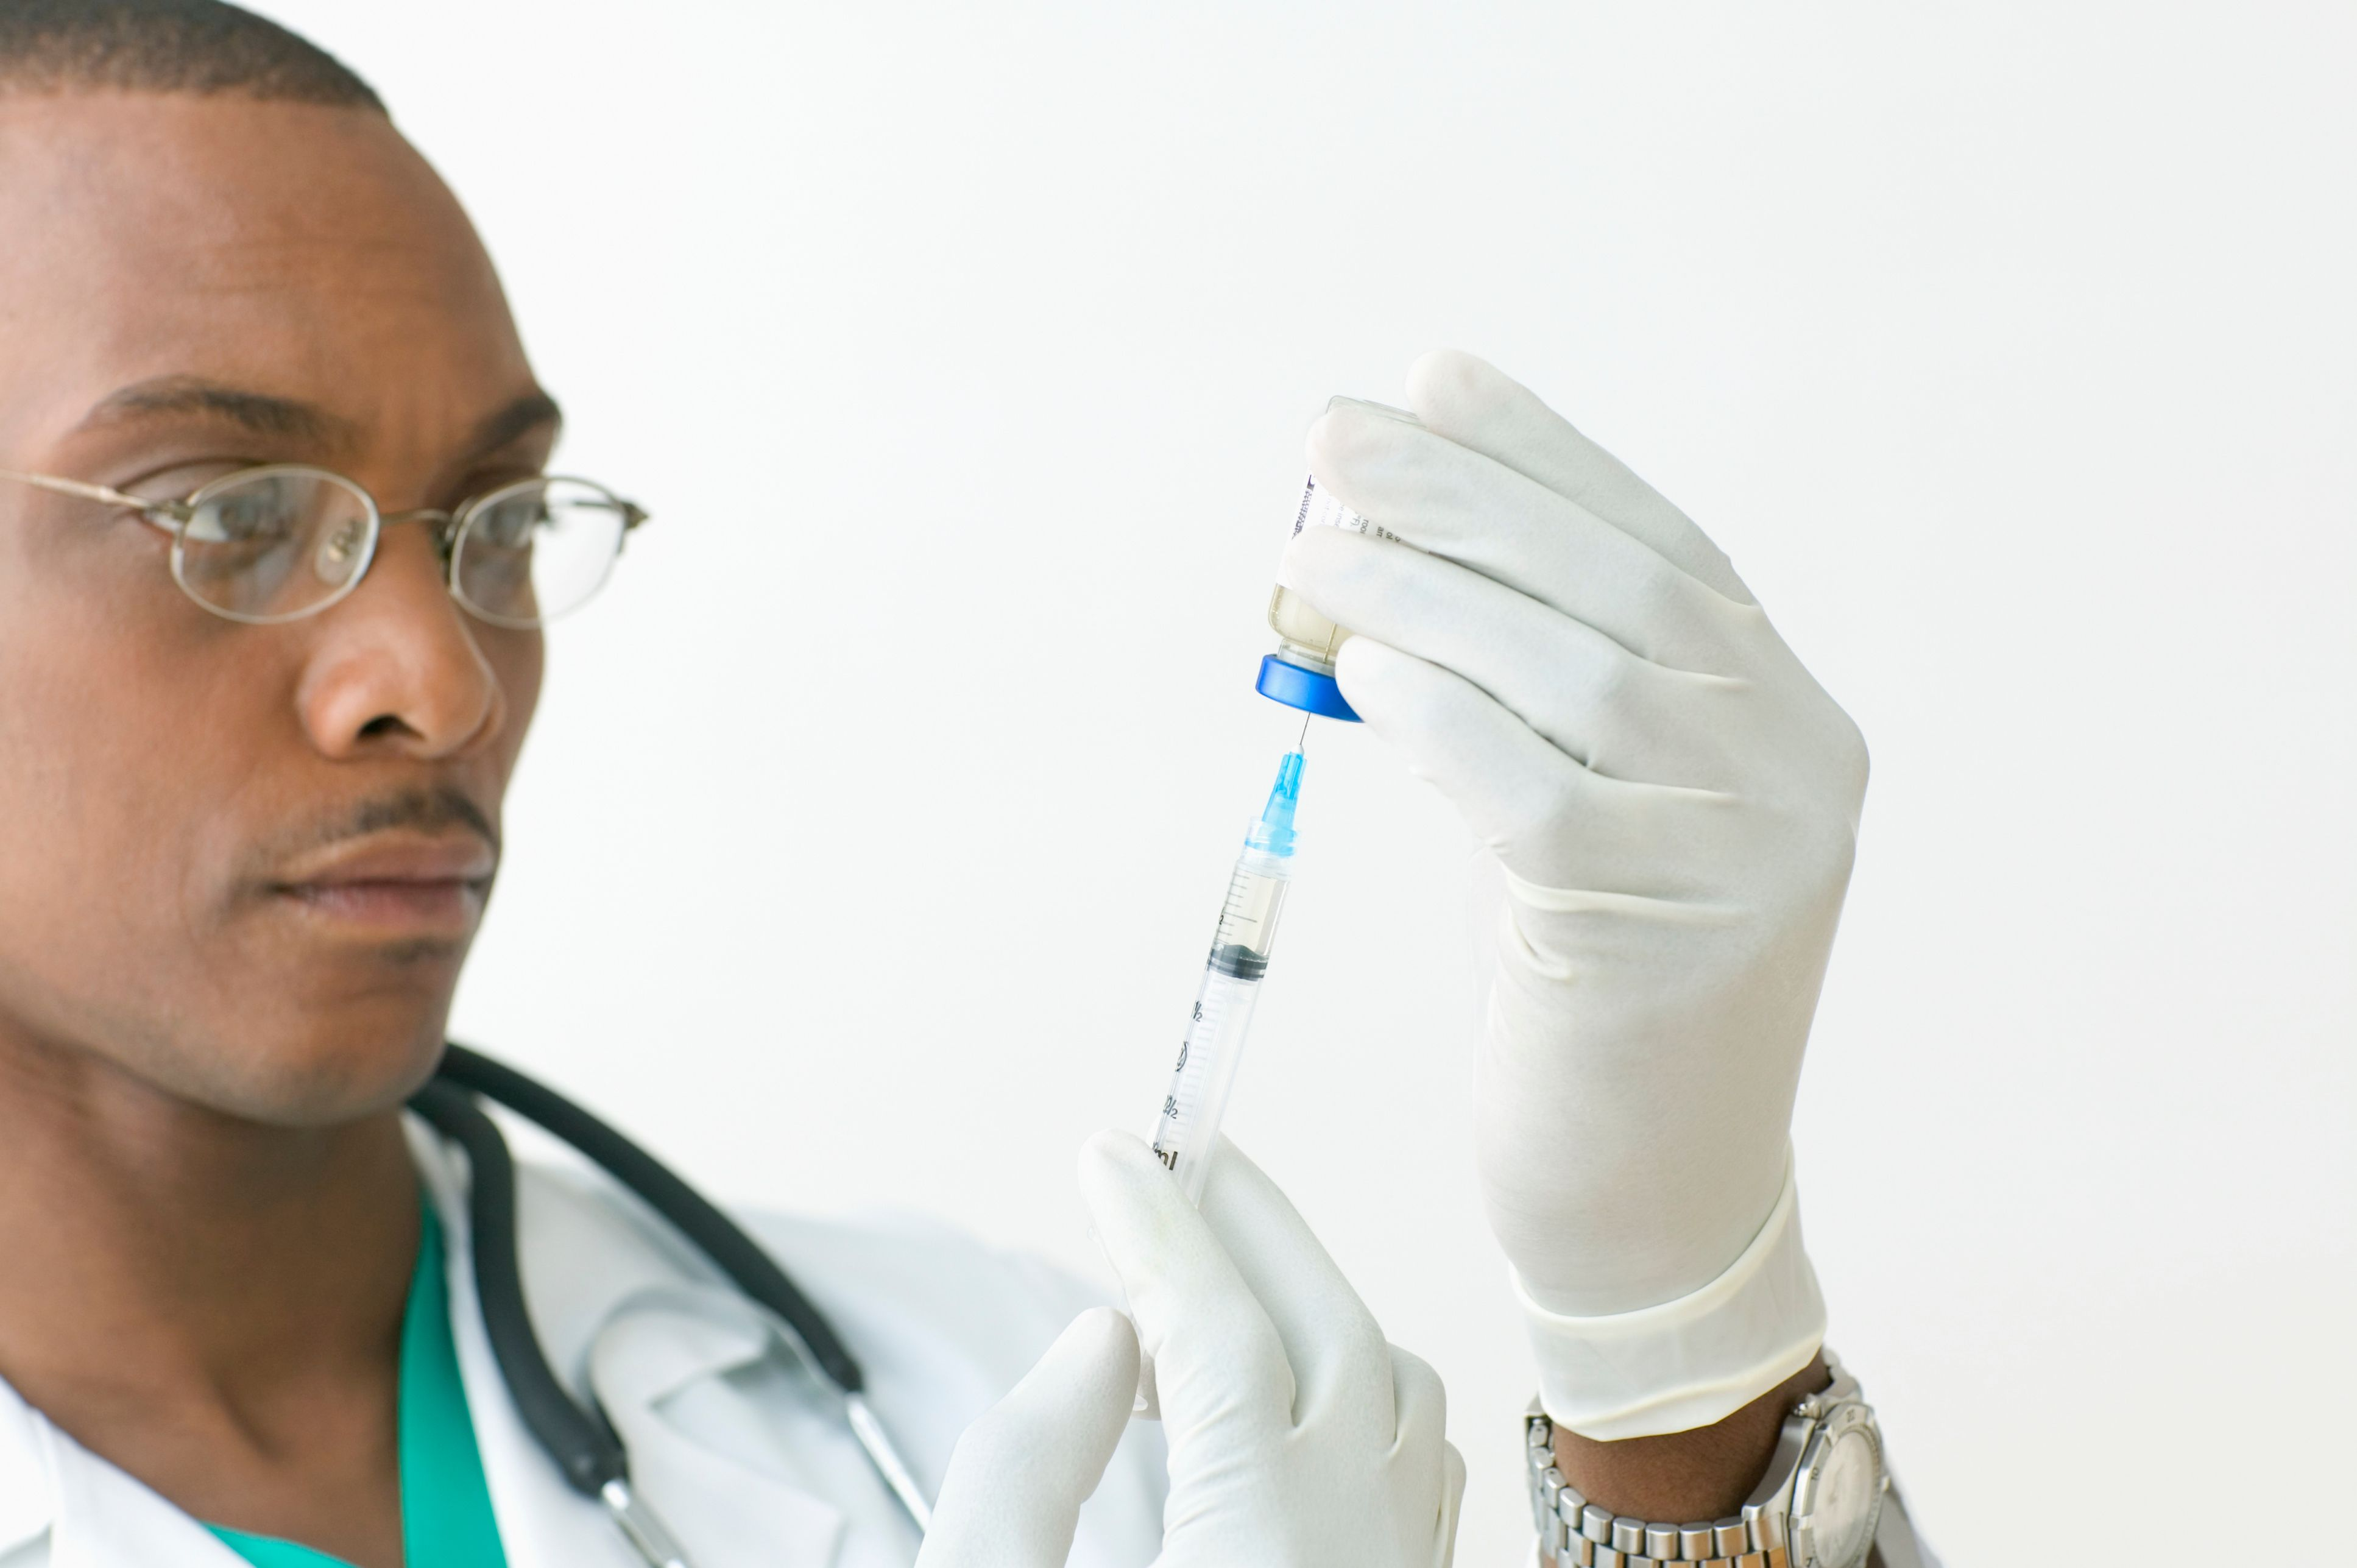 A clinician prepares a vaccination